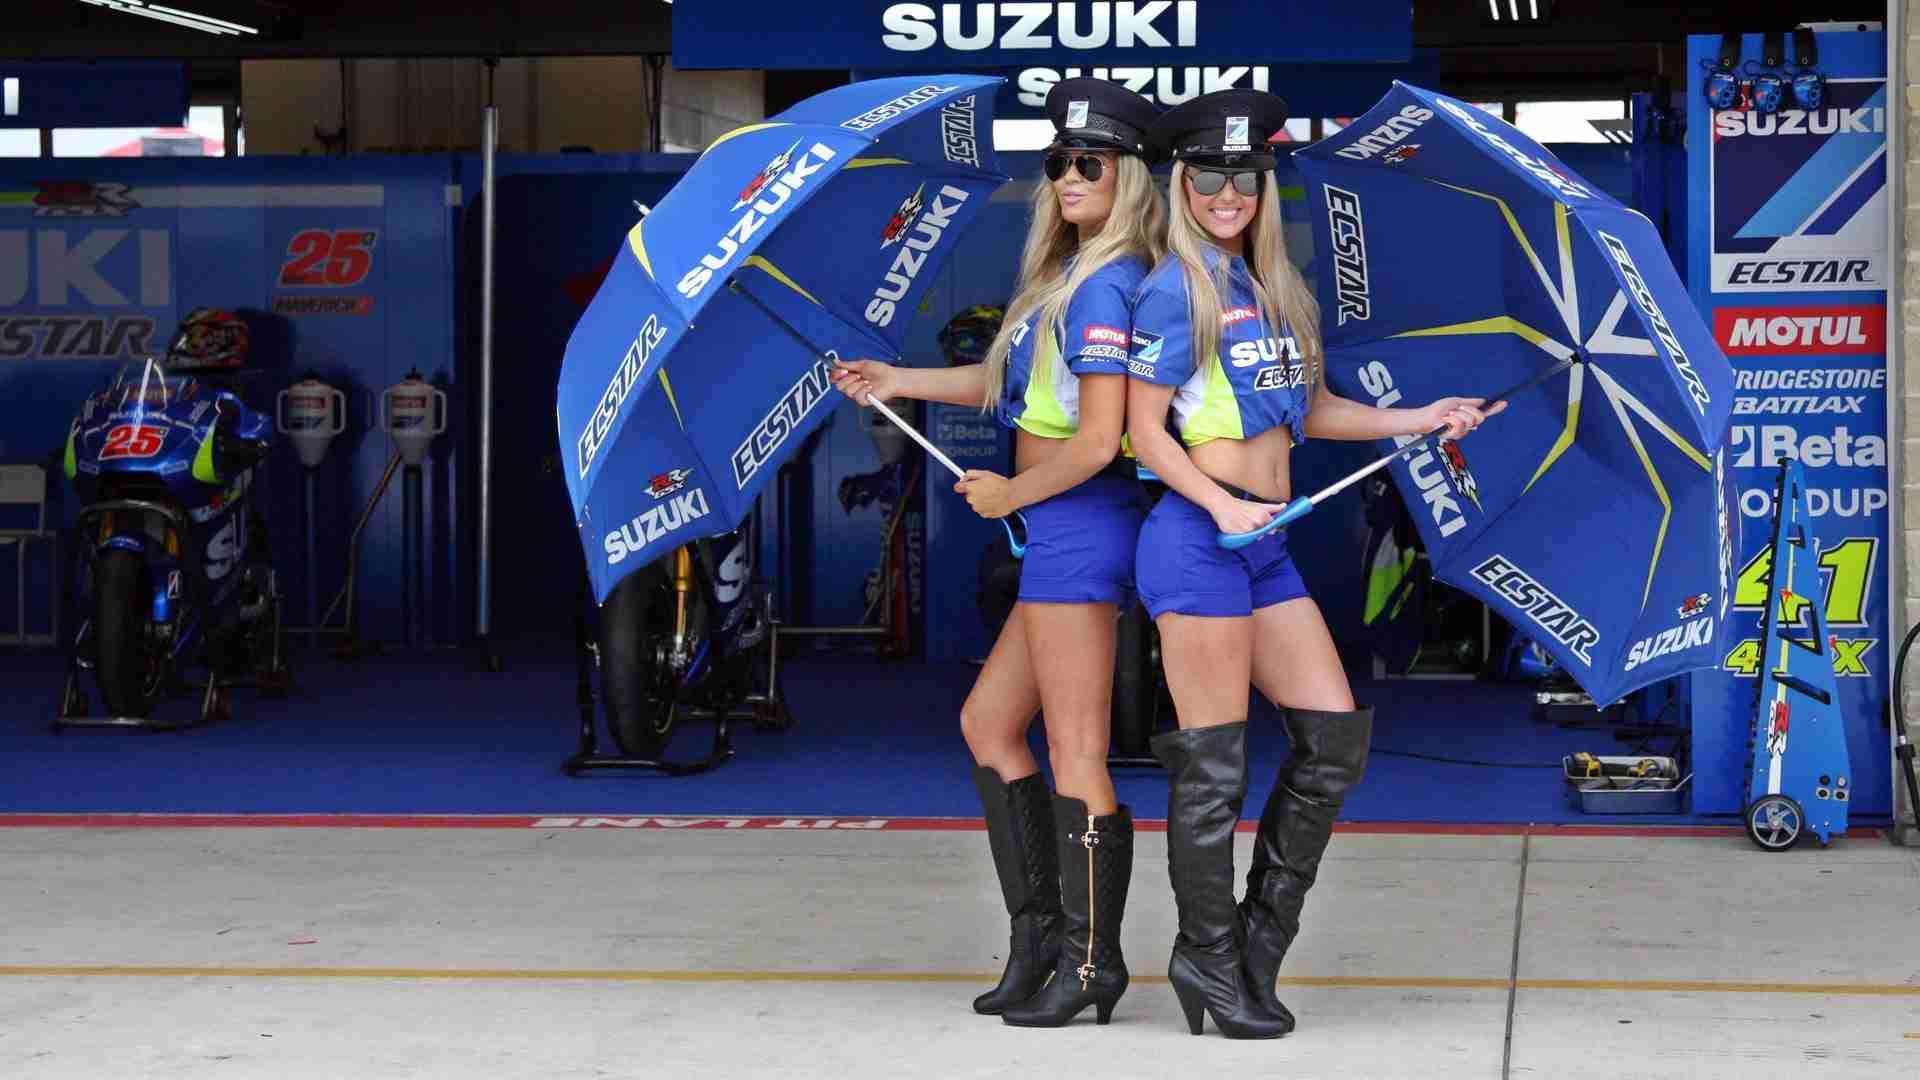 Suzuki paddock girls - MotoGP COTA Austin Texas